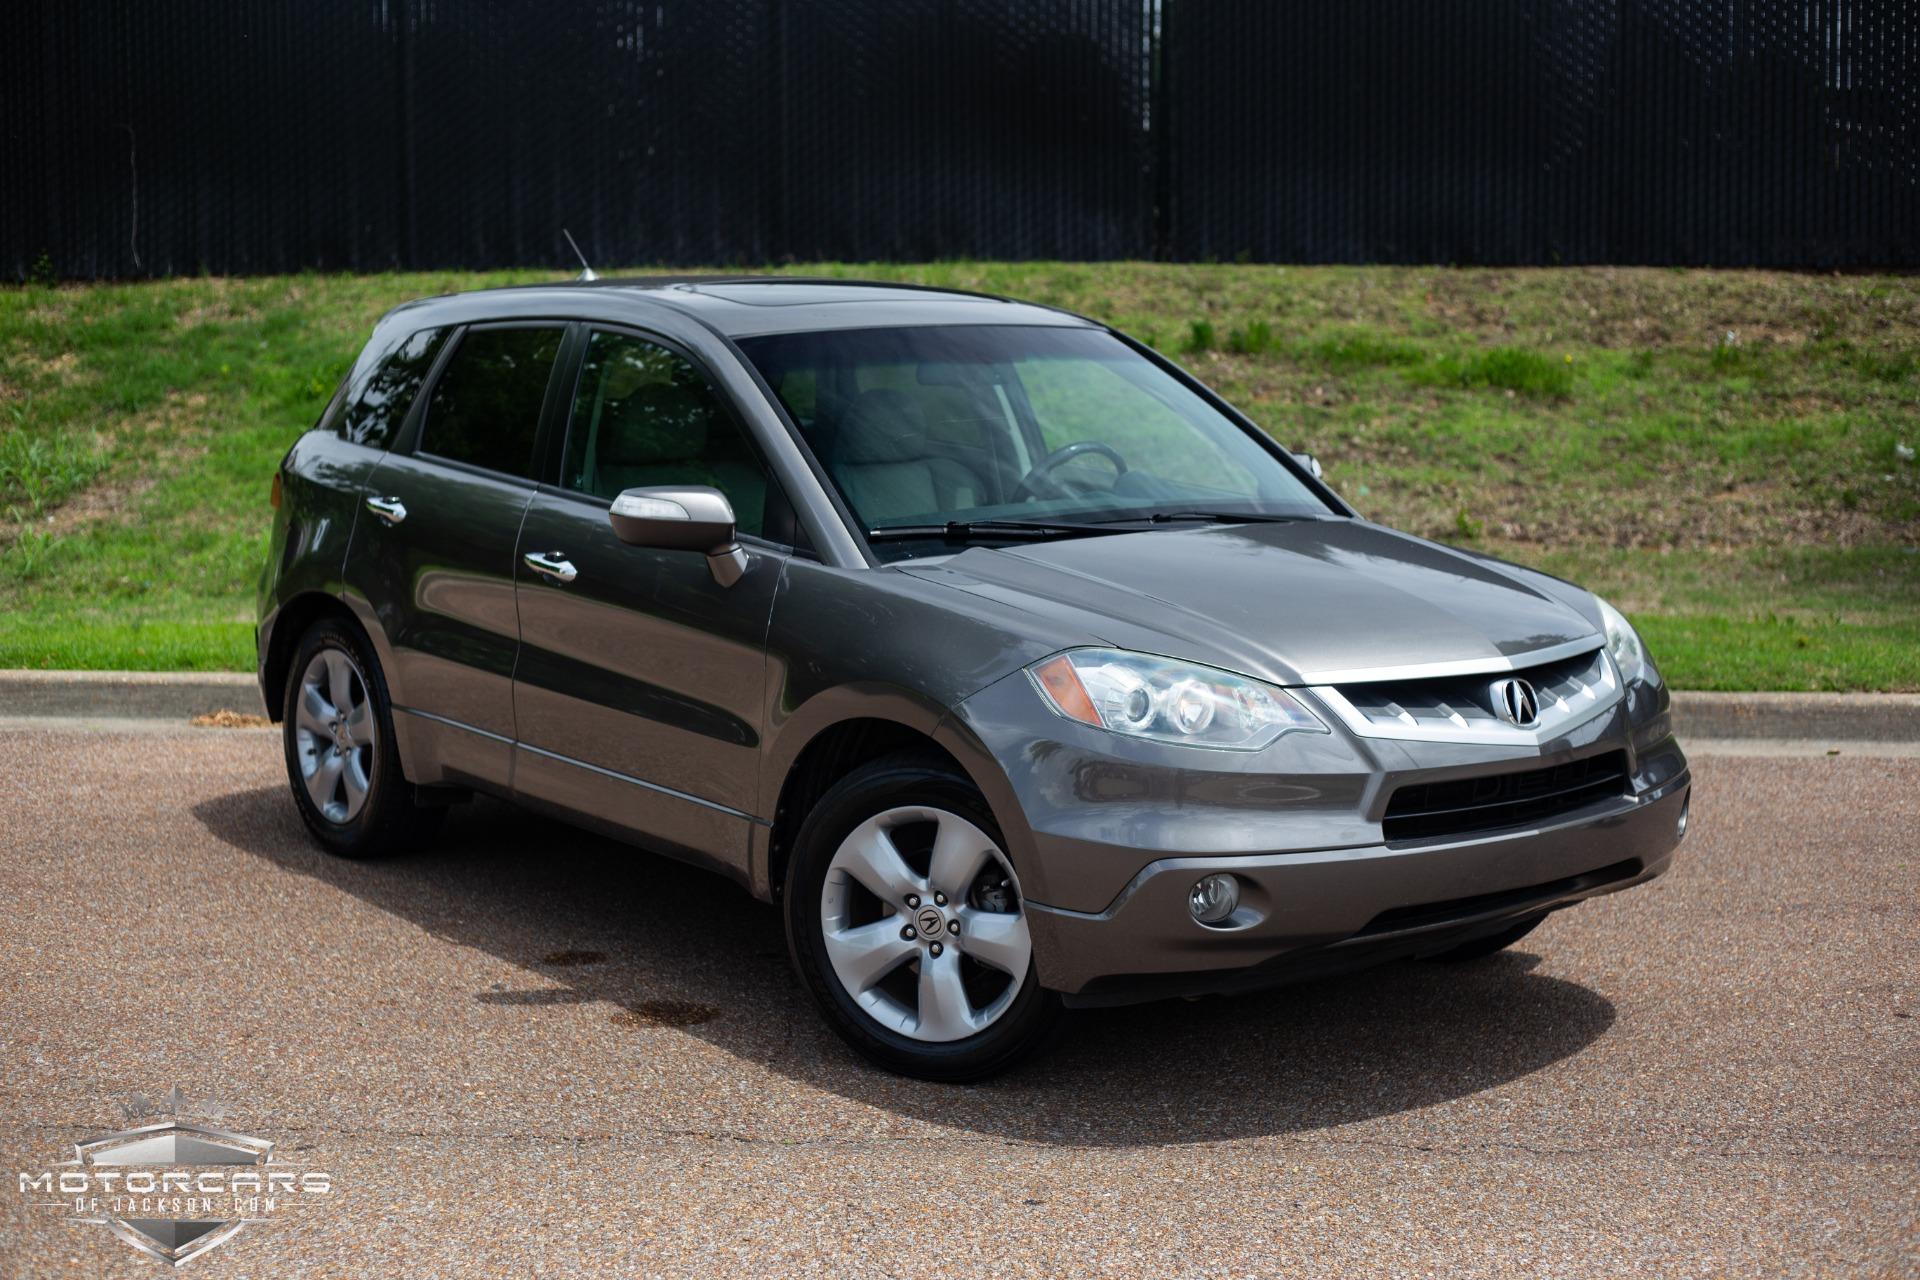 Used-2008-Acura-RDX-Tech-Pkg-for-sale-Jackson-MS